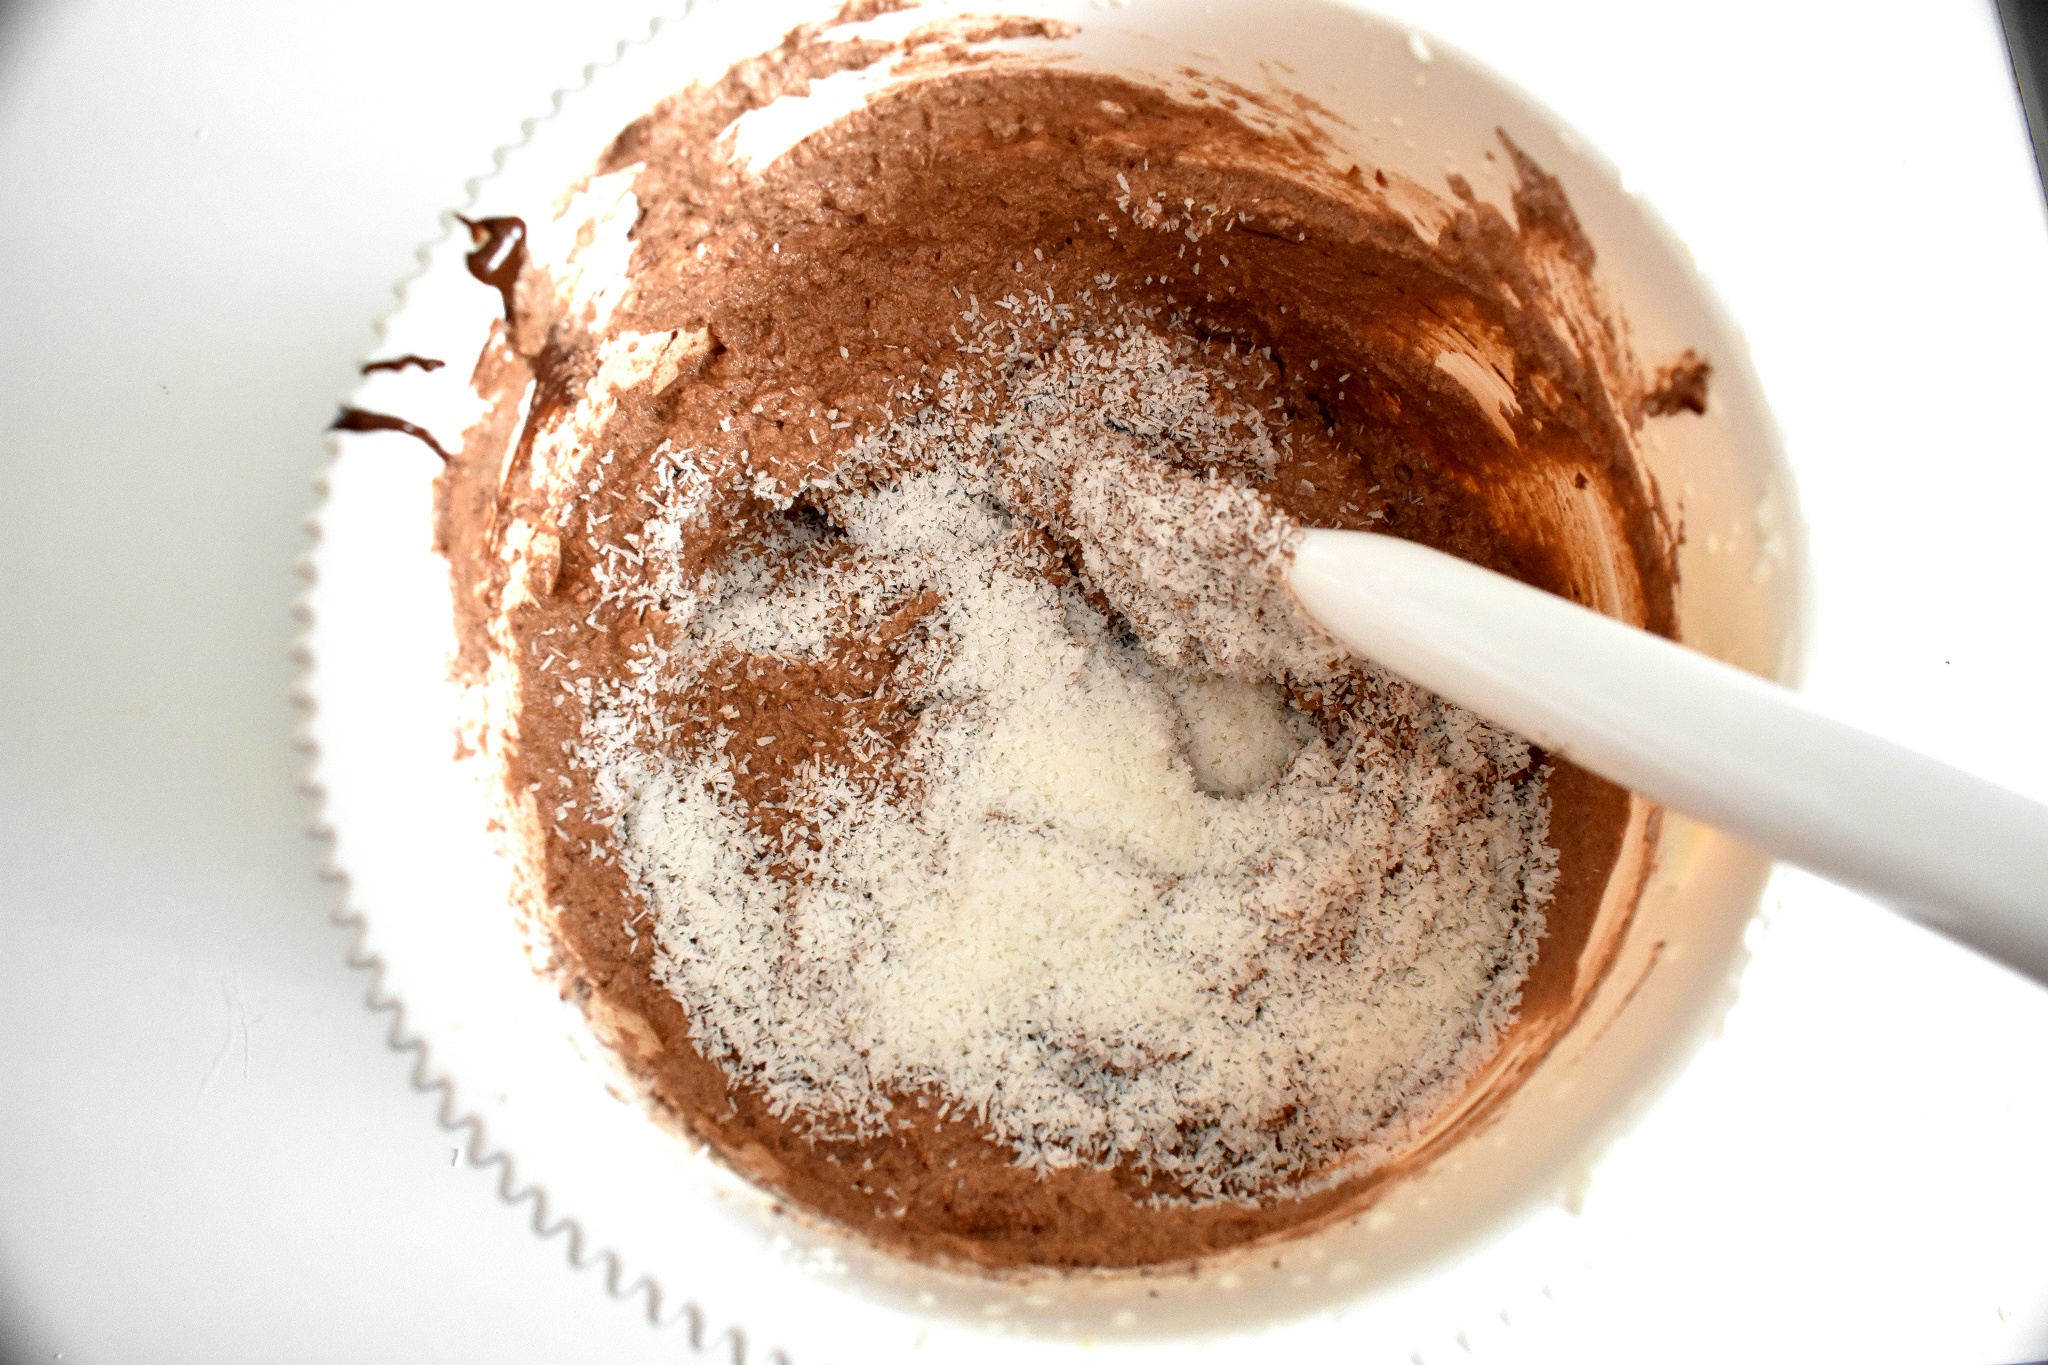 Chocolate-coconut-ice-cream-process-6-SunCakeMom